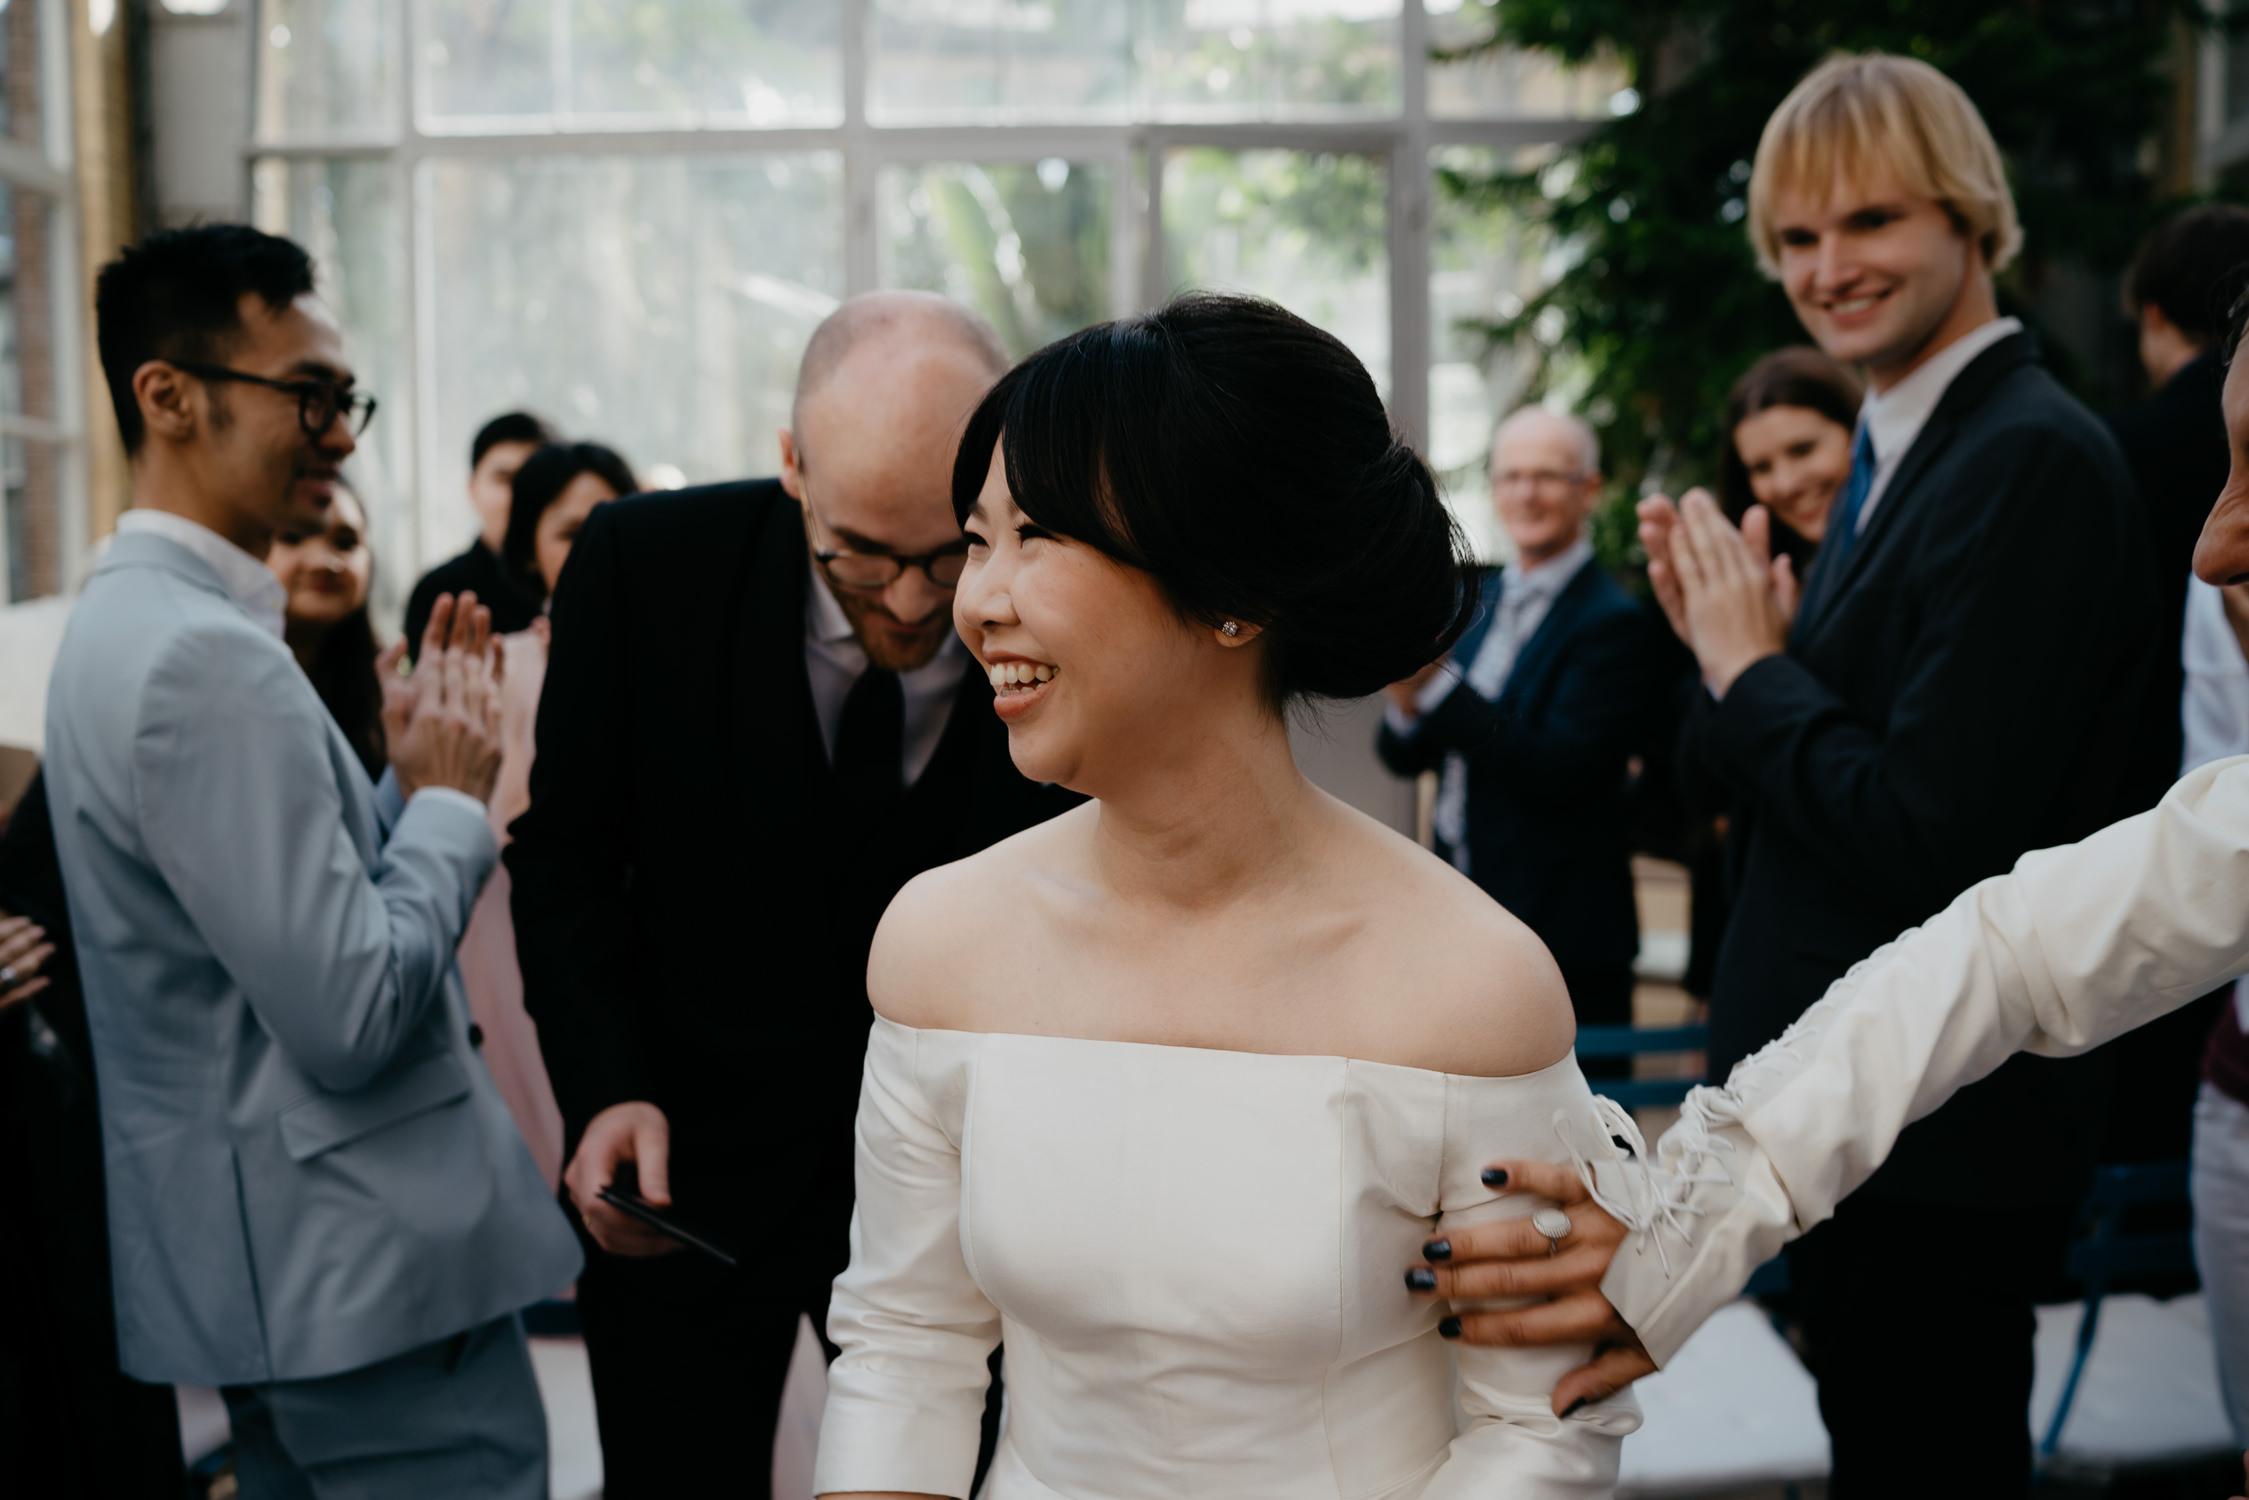 prachtige trouwfoto's na  trouwfotograaf mark hadden amsterdam nederland